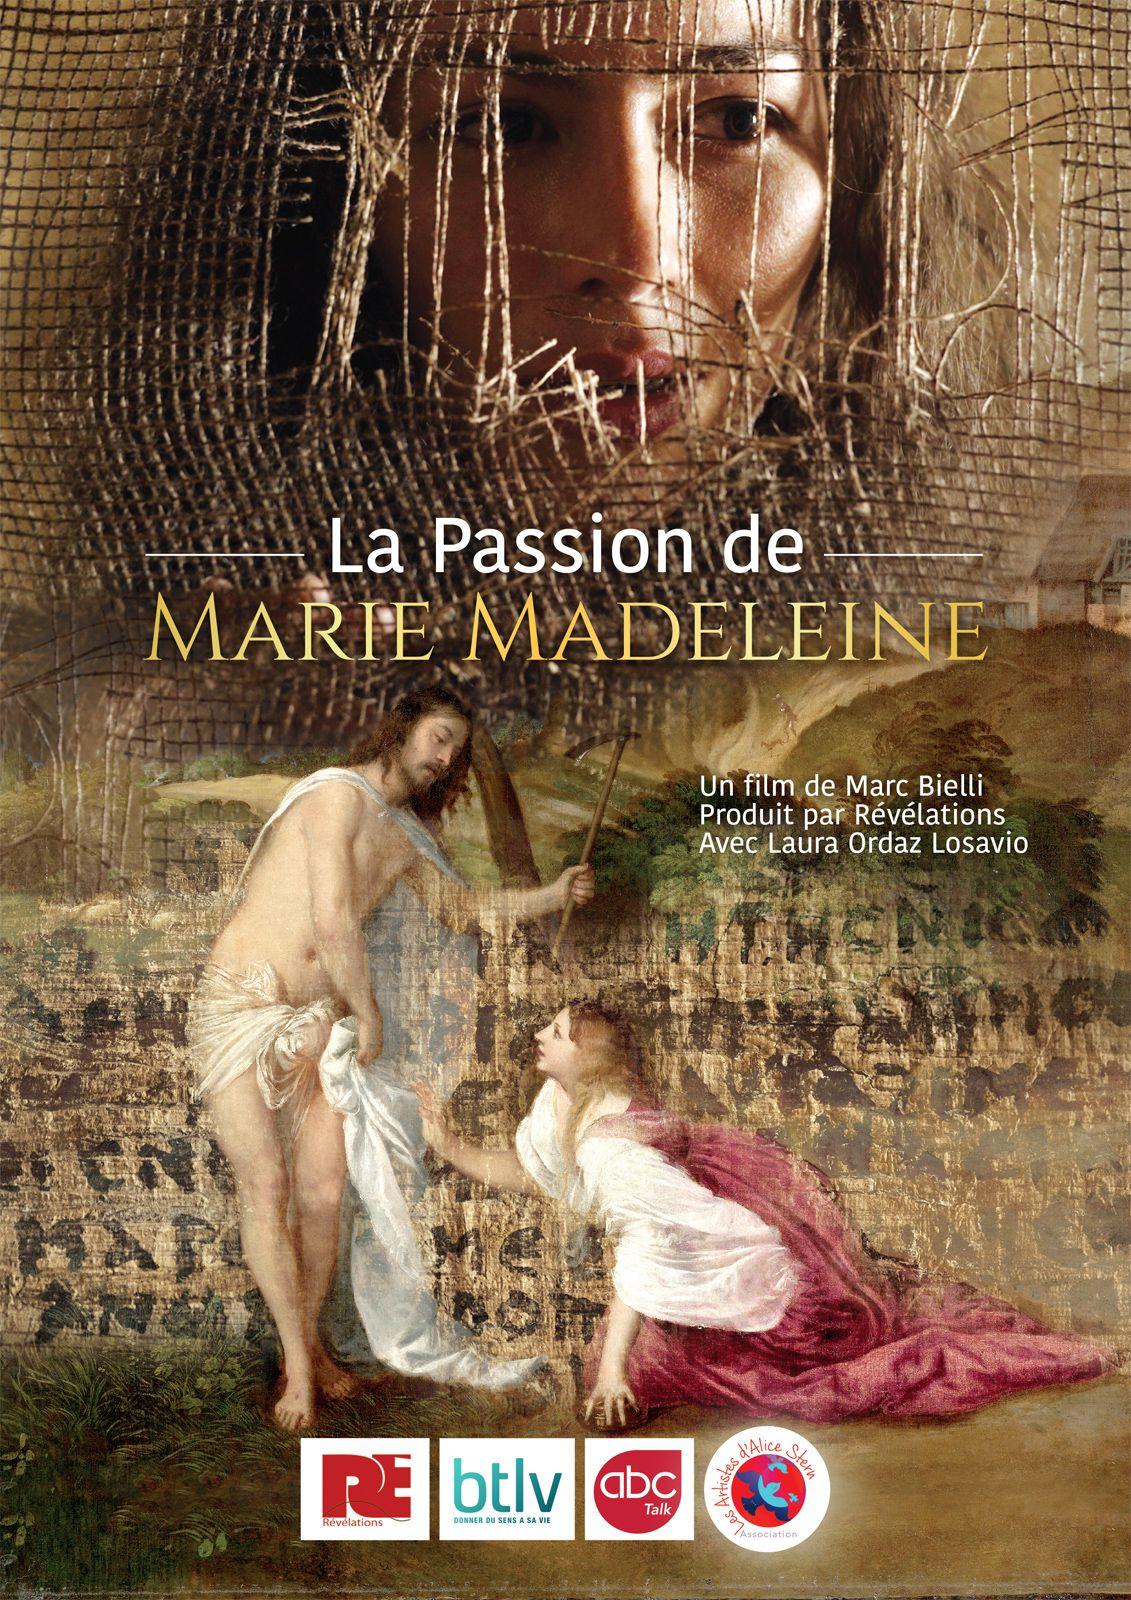 La Passion de Marie Madeleine - Documentaire (2019)